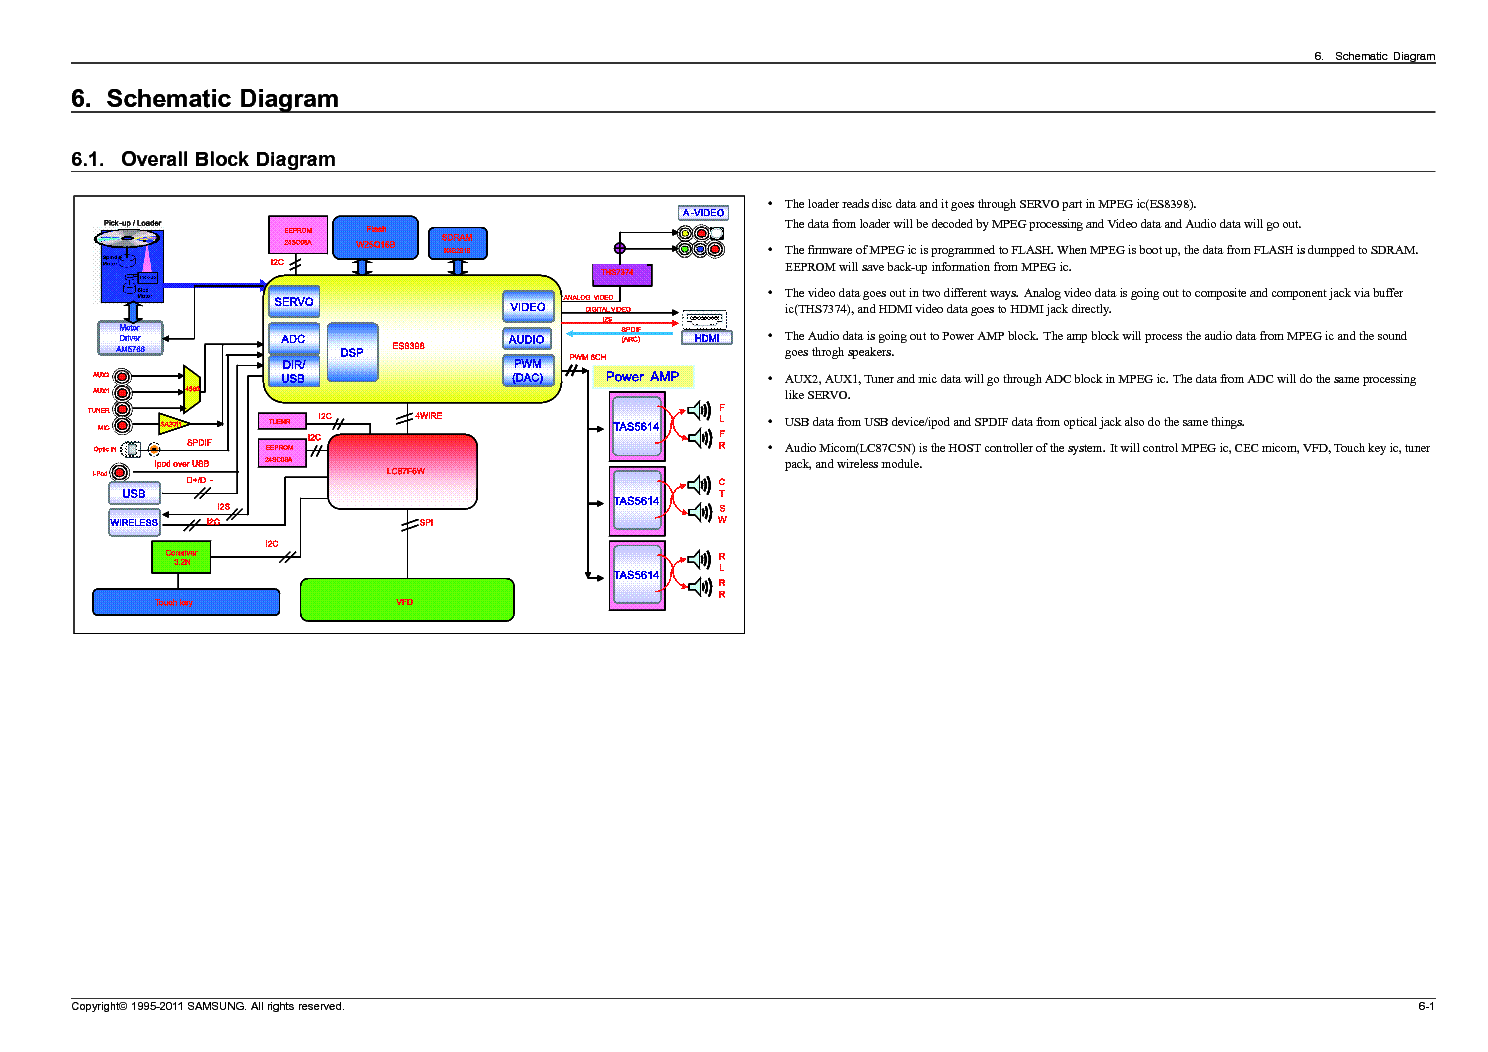 Samsung Ht D550 D450 Sch Service Manual Download Schematics Mpeg 1 Block Diagram 1st Page